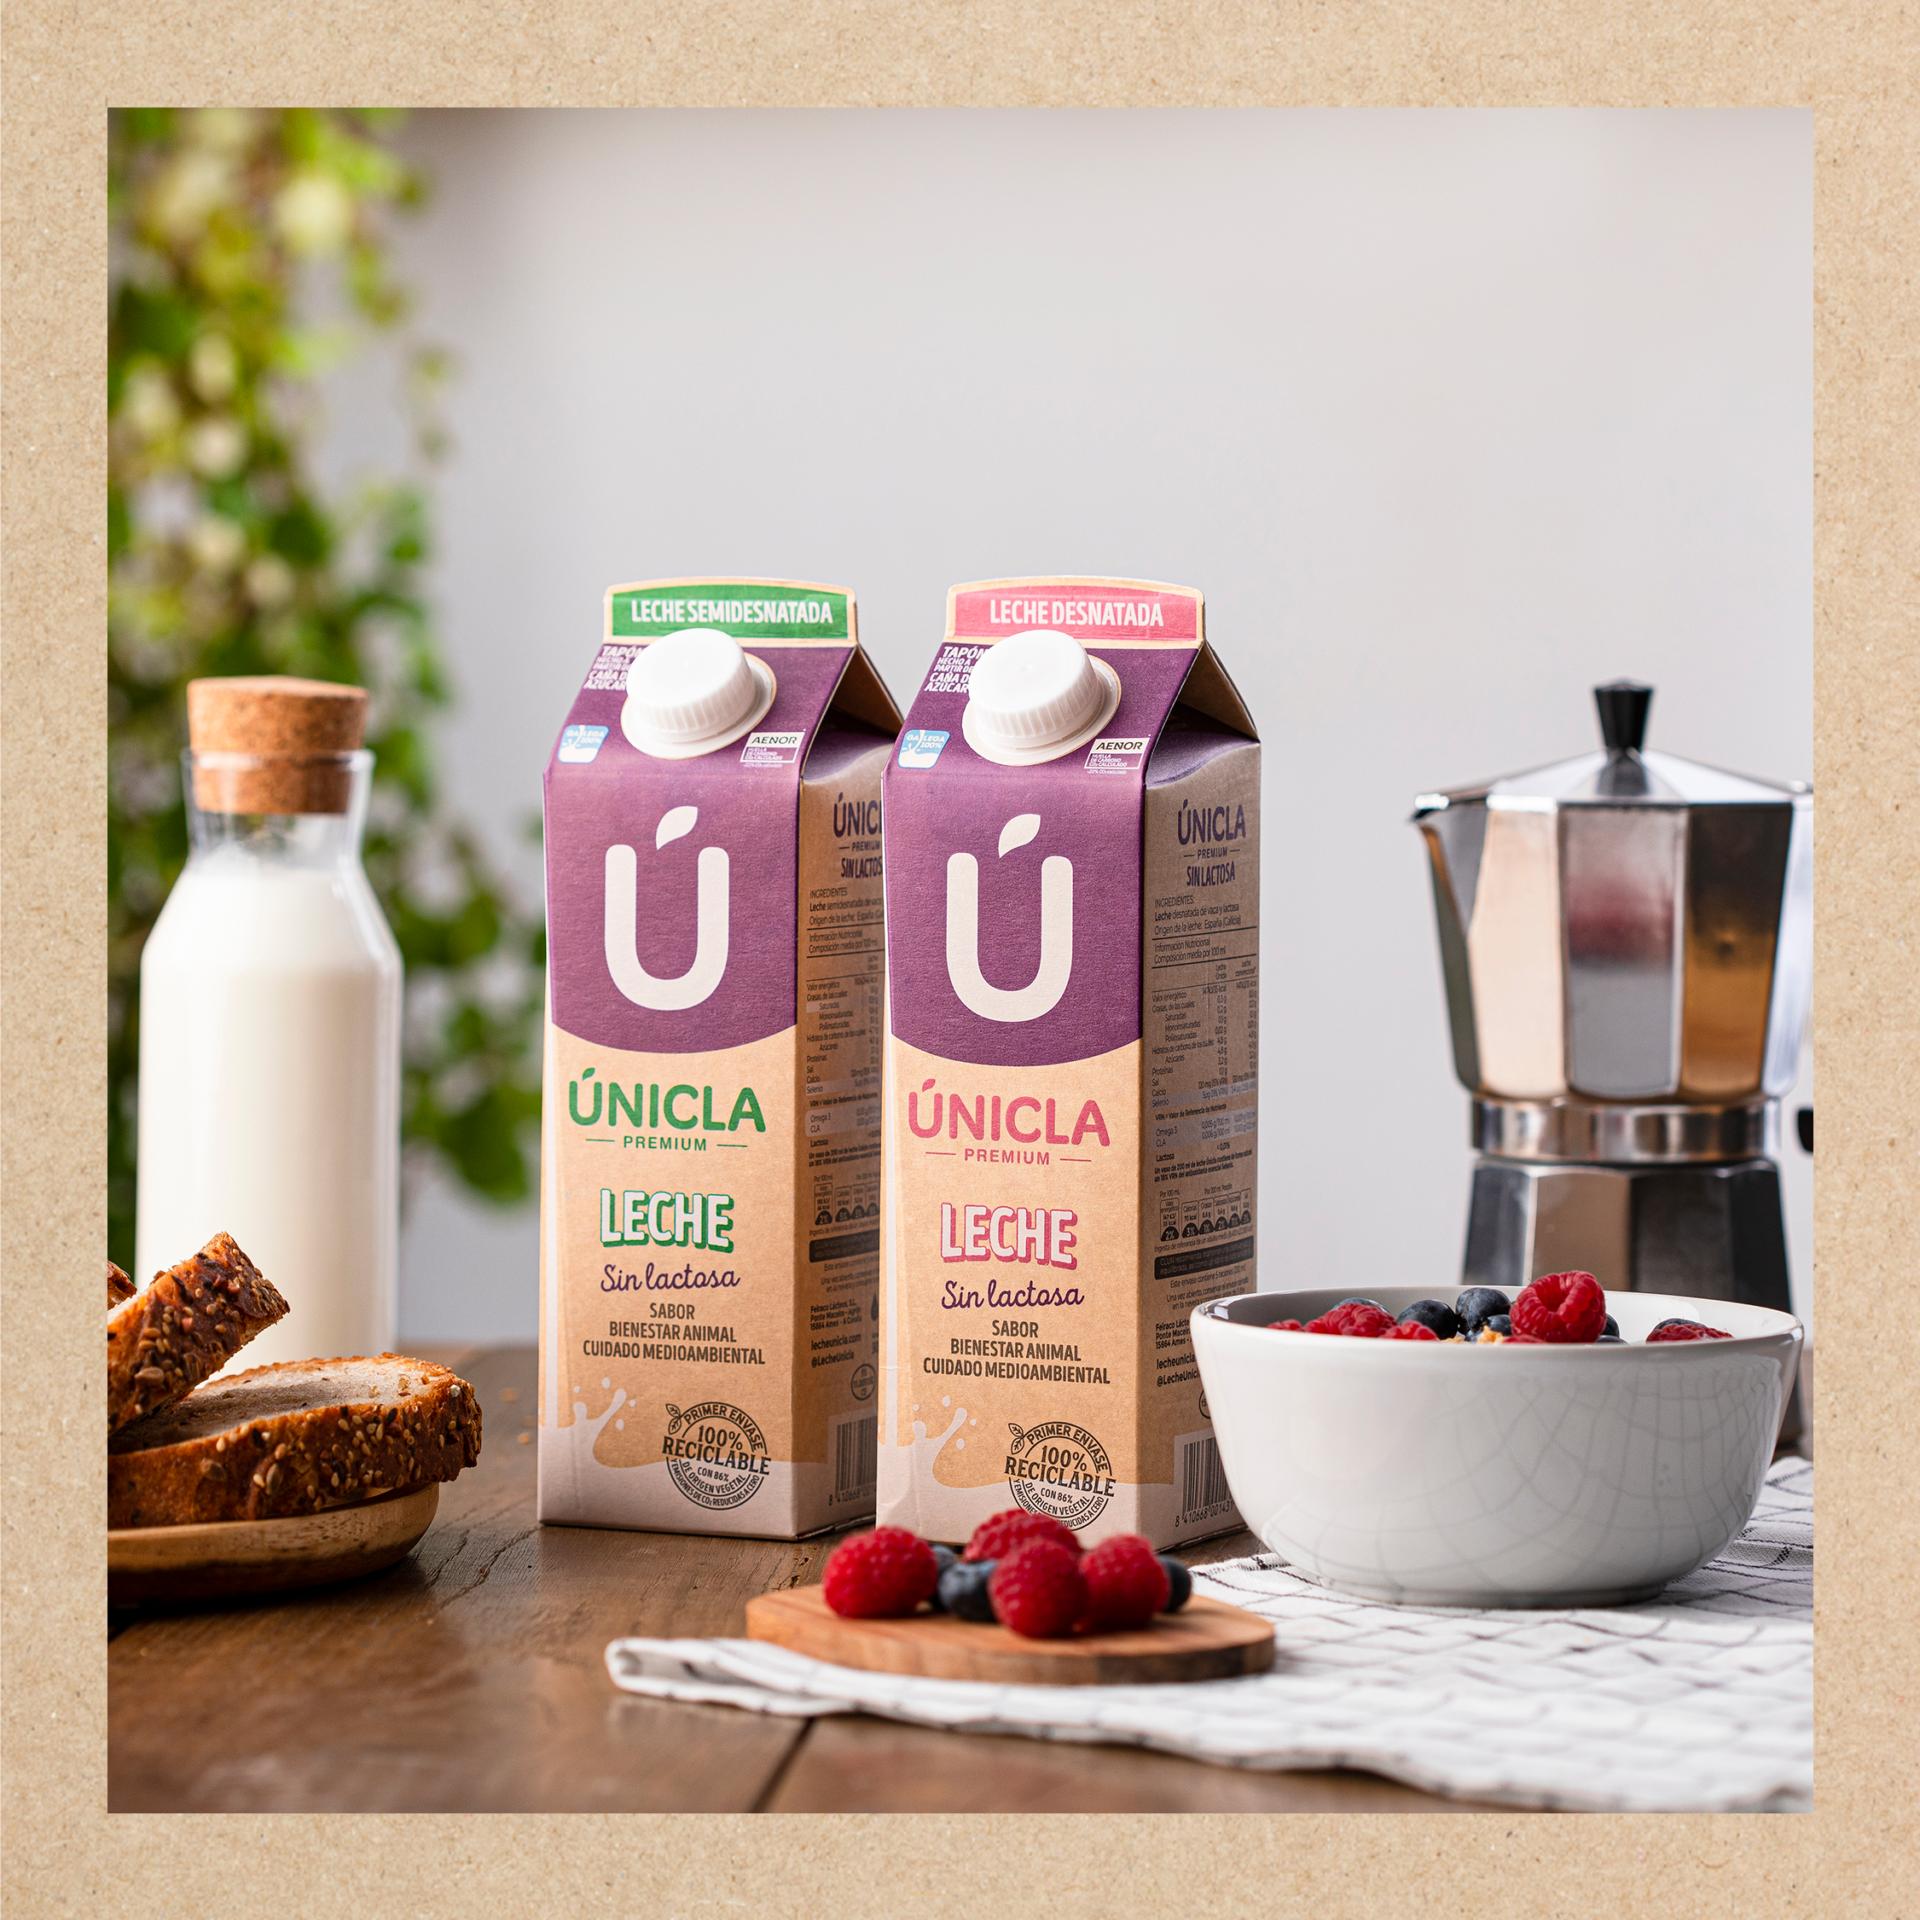 Imagen de dos brick de leche para intolerantes a la lactosa